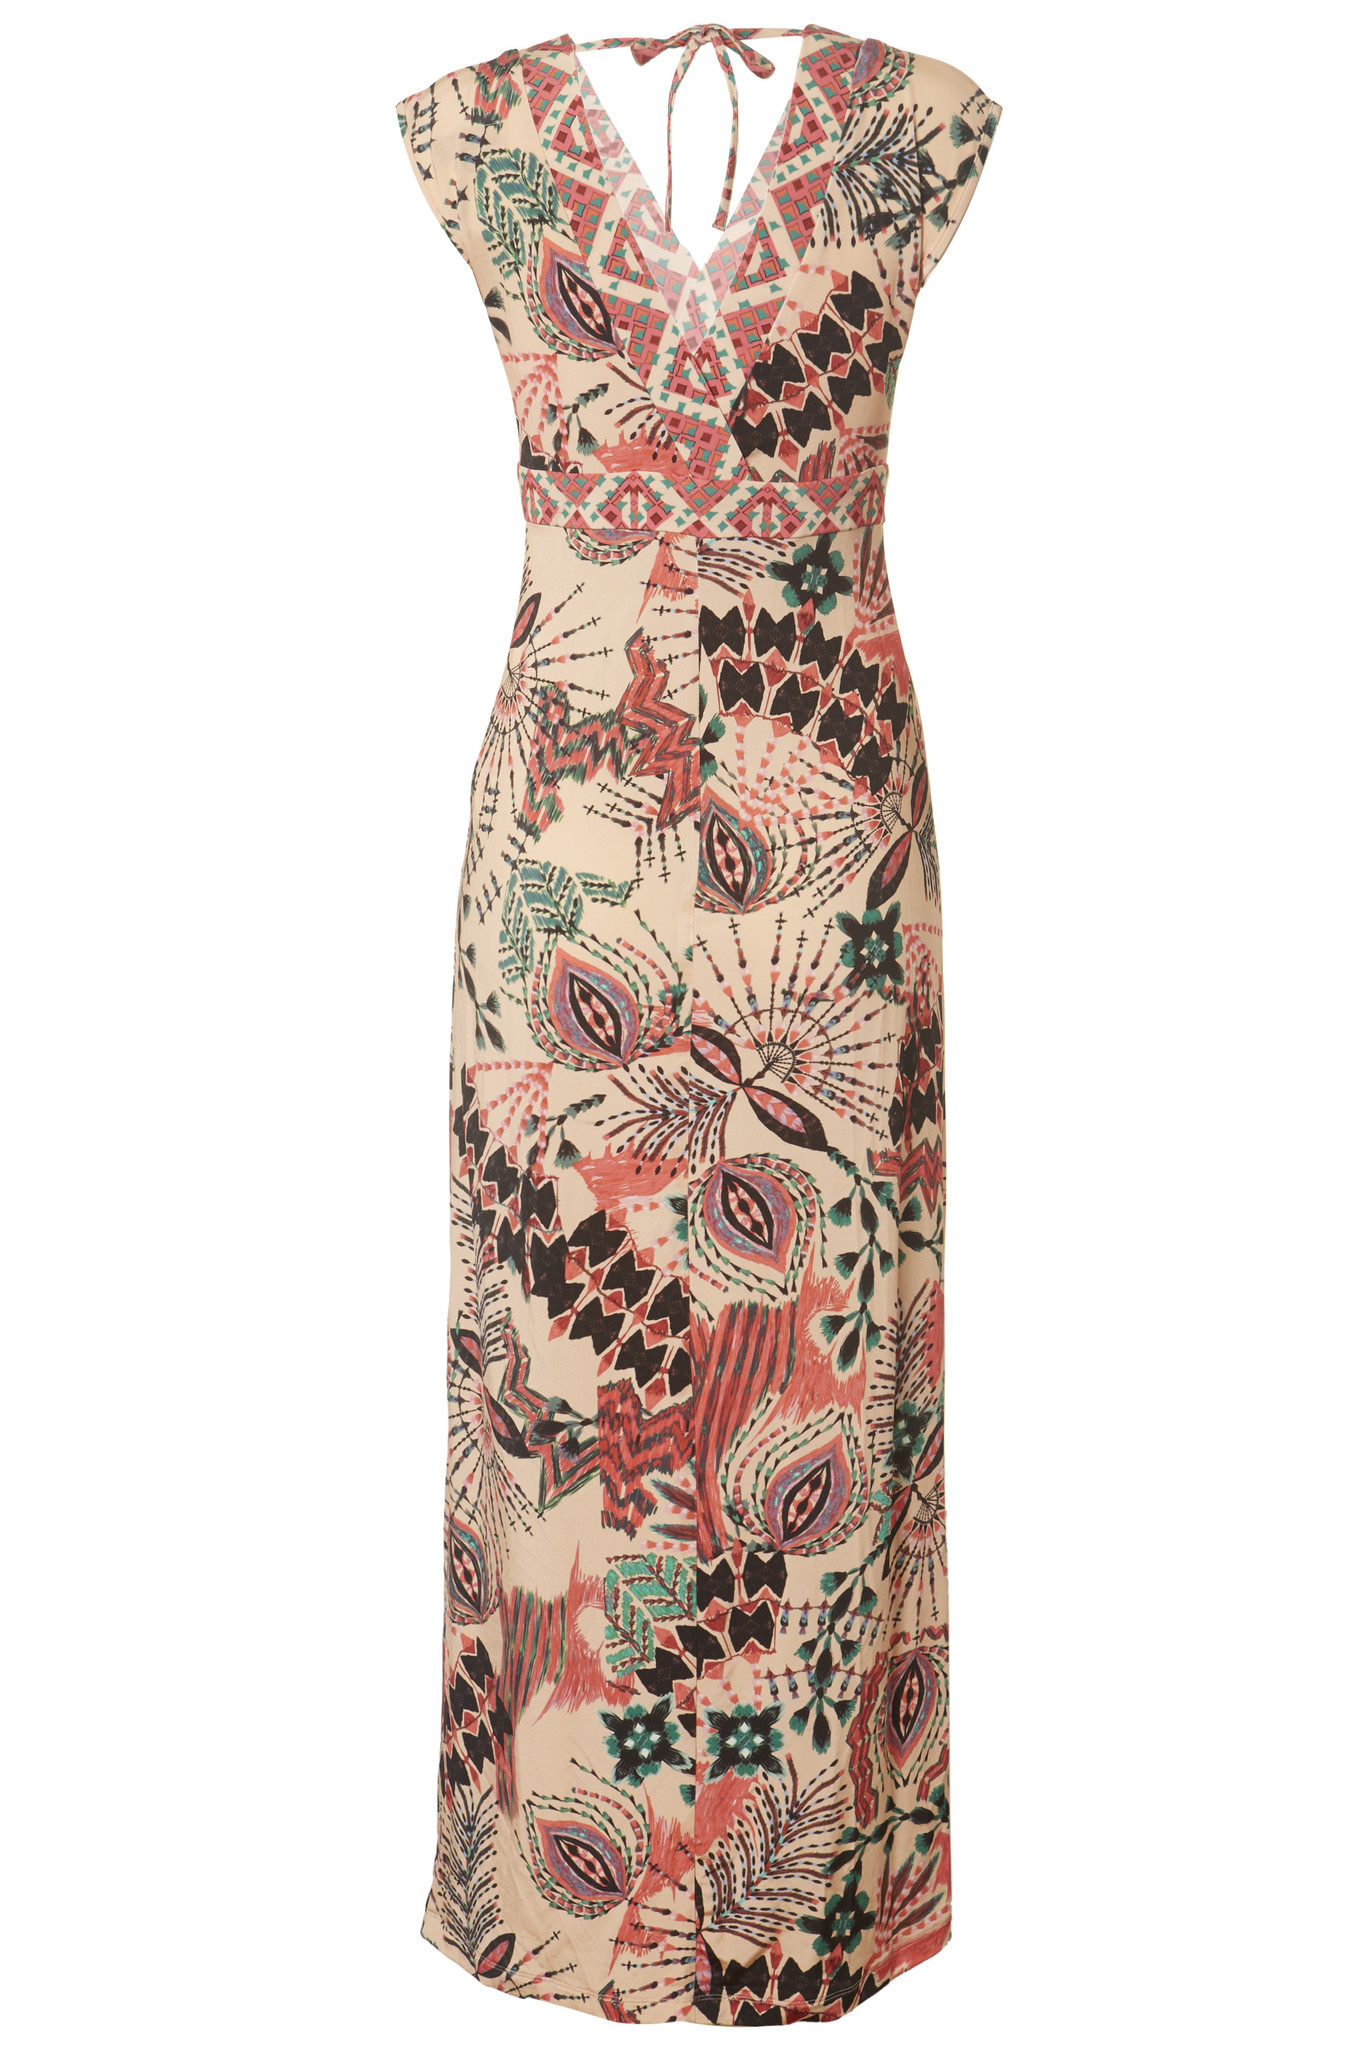 TESSA KOOPS MEGHAN PEACHES DRESS